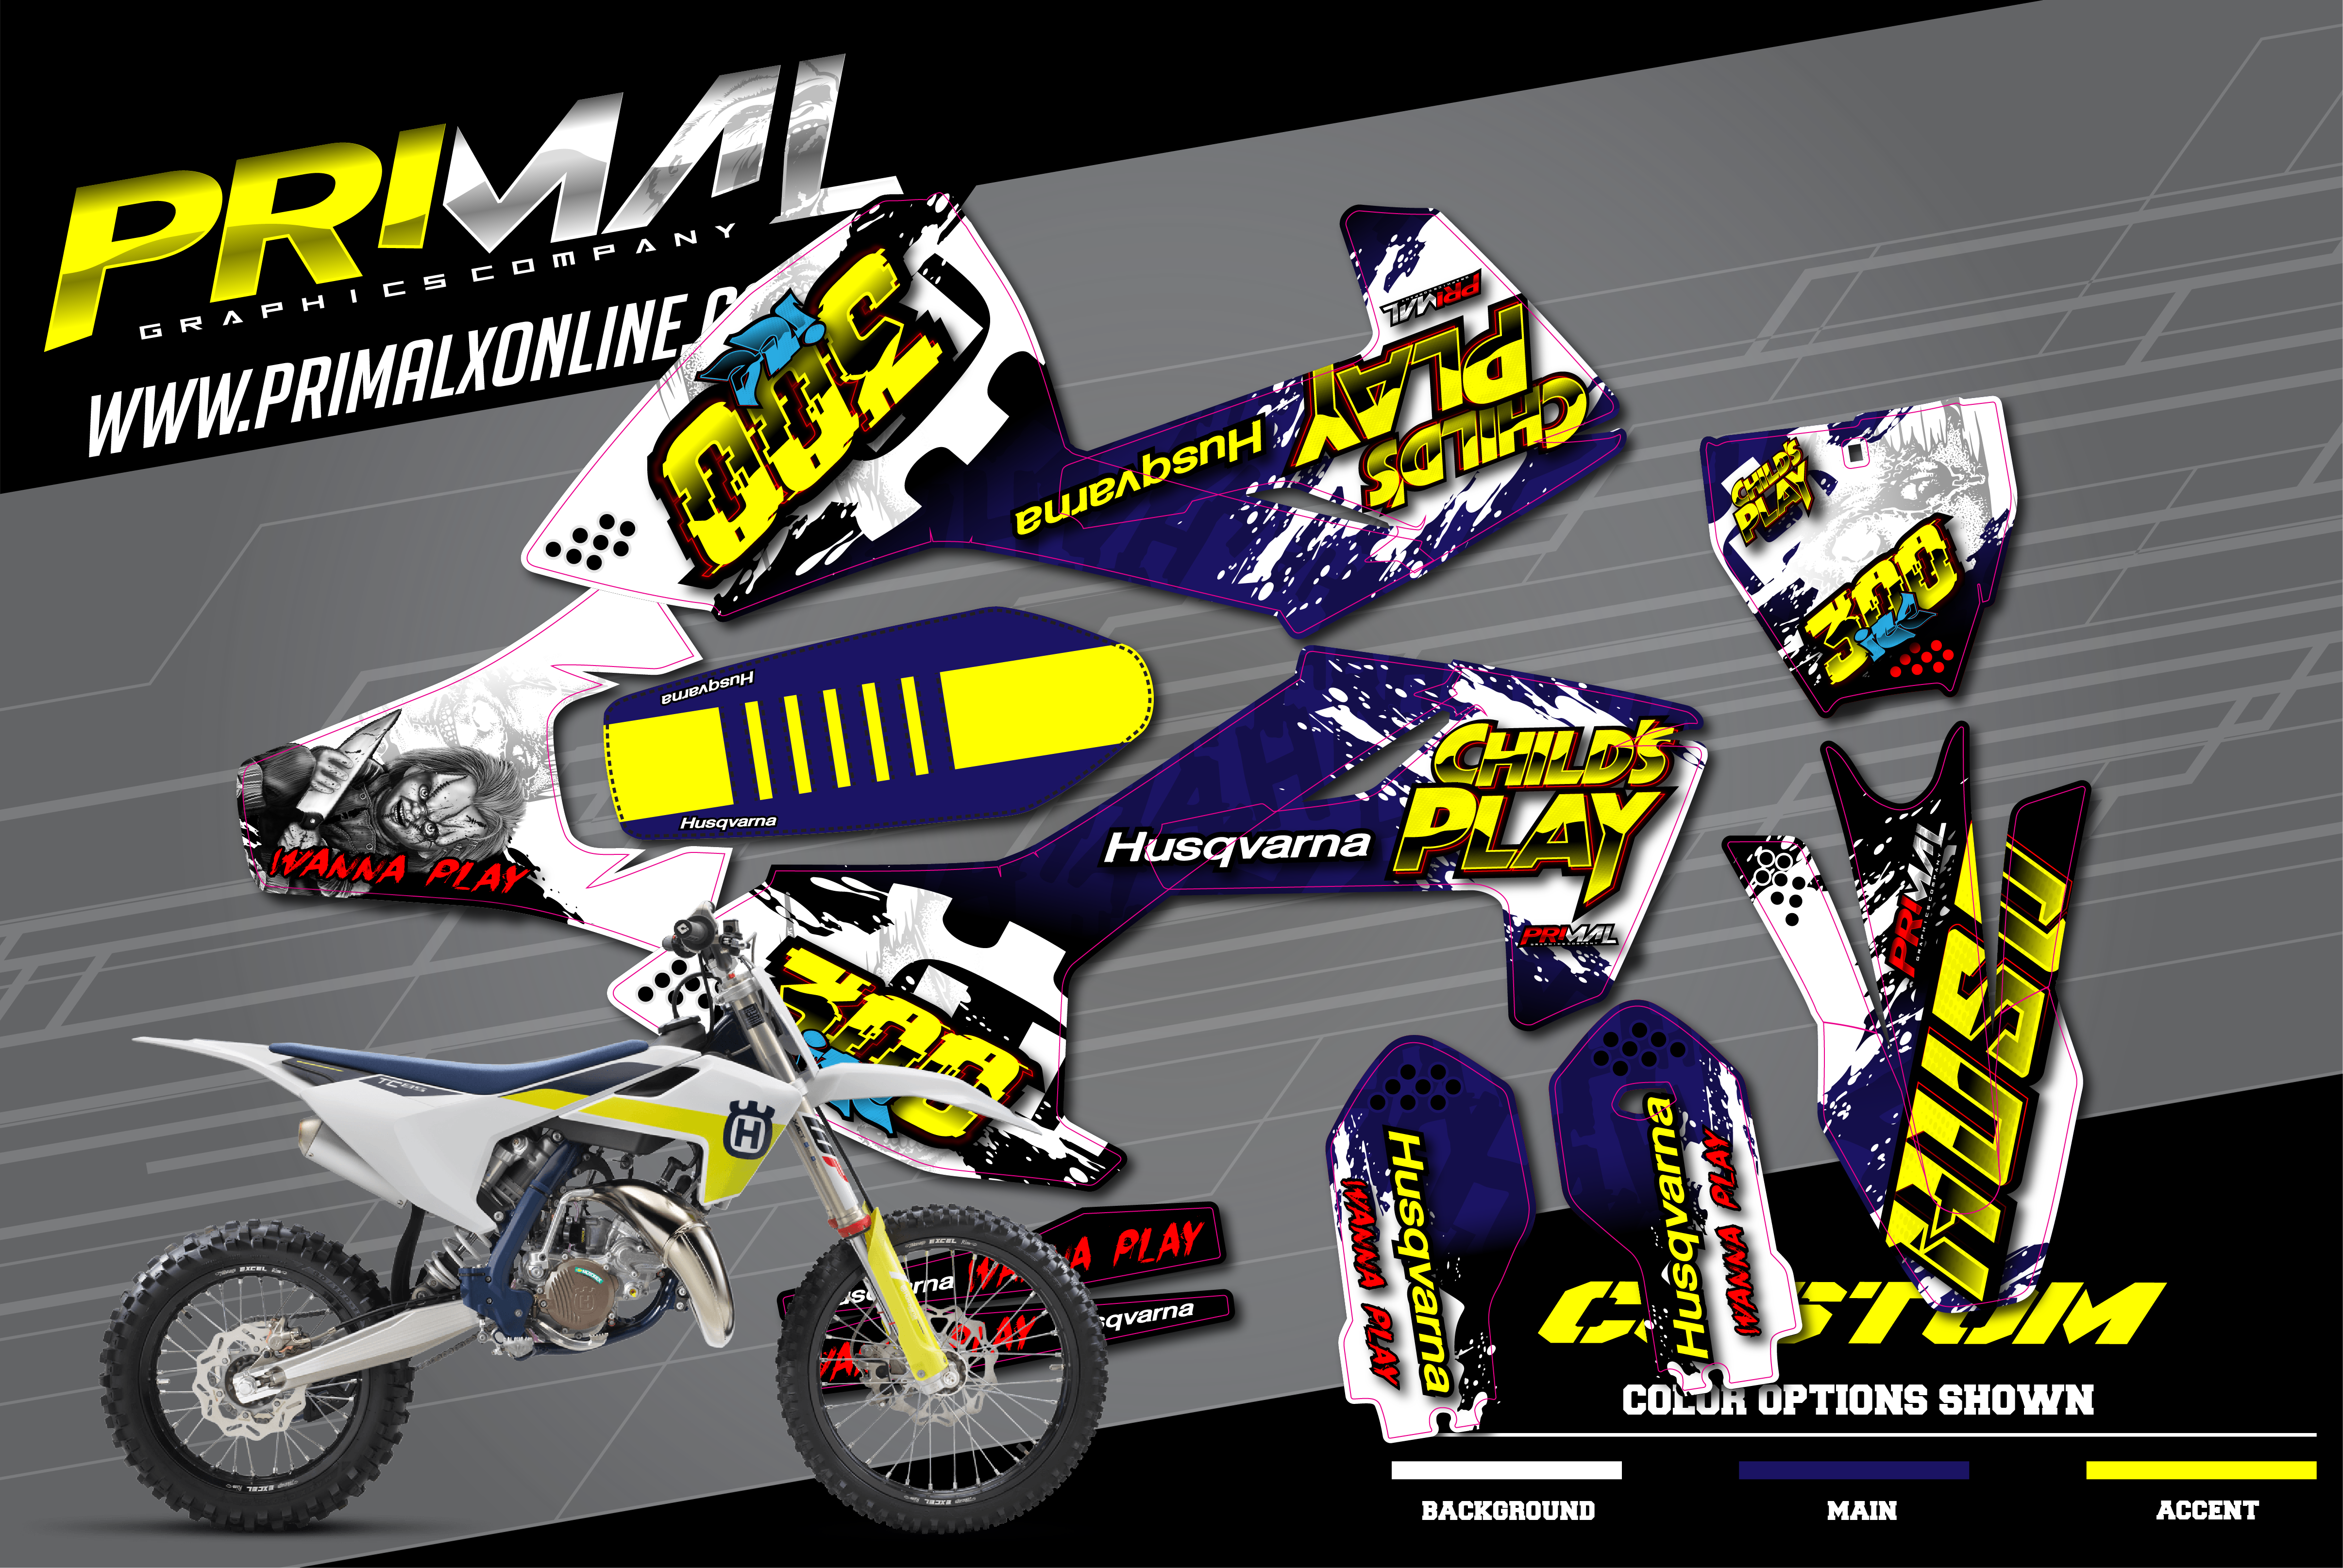 1_PRIMAL-X-MOTORSPORTS-PRIMAL-GRAPHICS-CO-HUSQVARNA-85-BIKELIFE-SERIES-MOTOCROSS-GRAPHICS-RETRO-PRIMAL-GFX-CO-MX-GRAPHICS-MX-DECALS-01-01-01